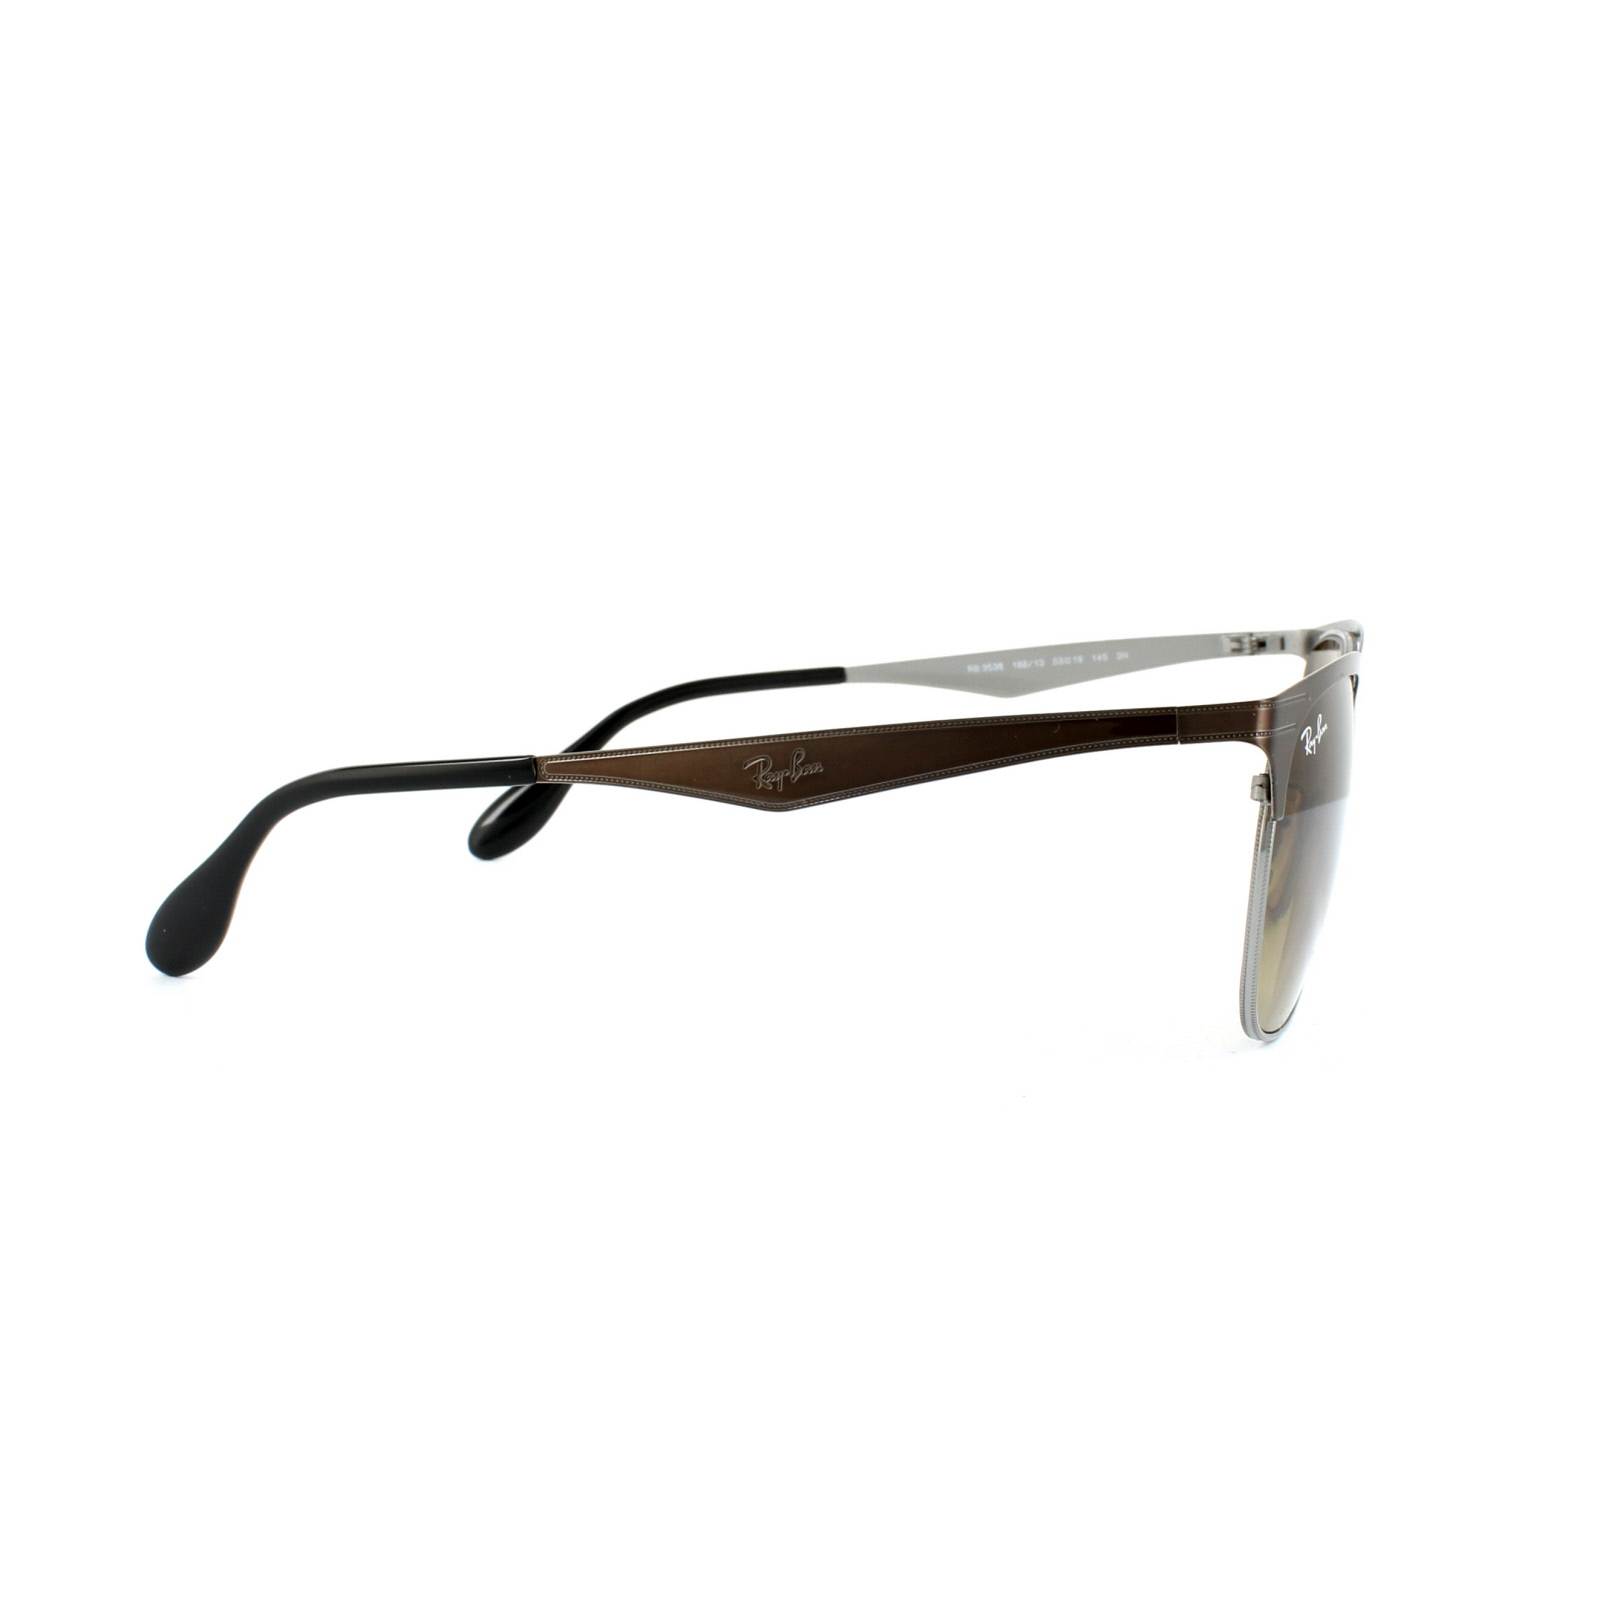 1a74f6f987 Sentinel Ray-Ban Sunglasses 3538 188 13 Brown   Gunmetal Brown Gradient